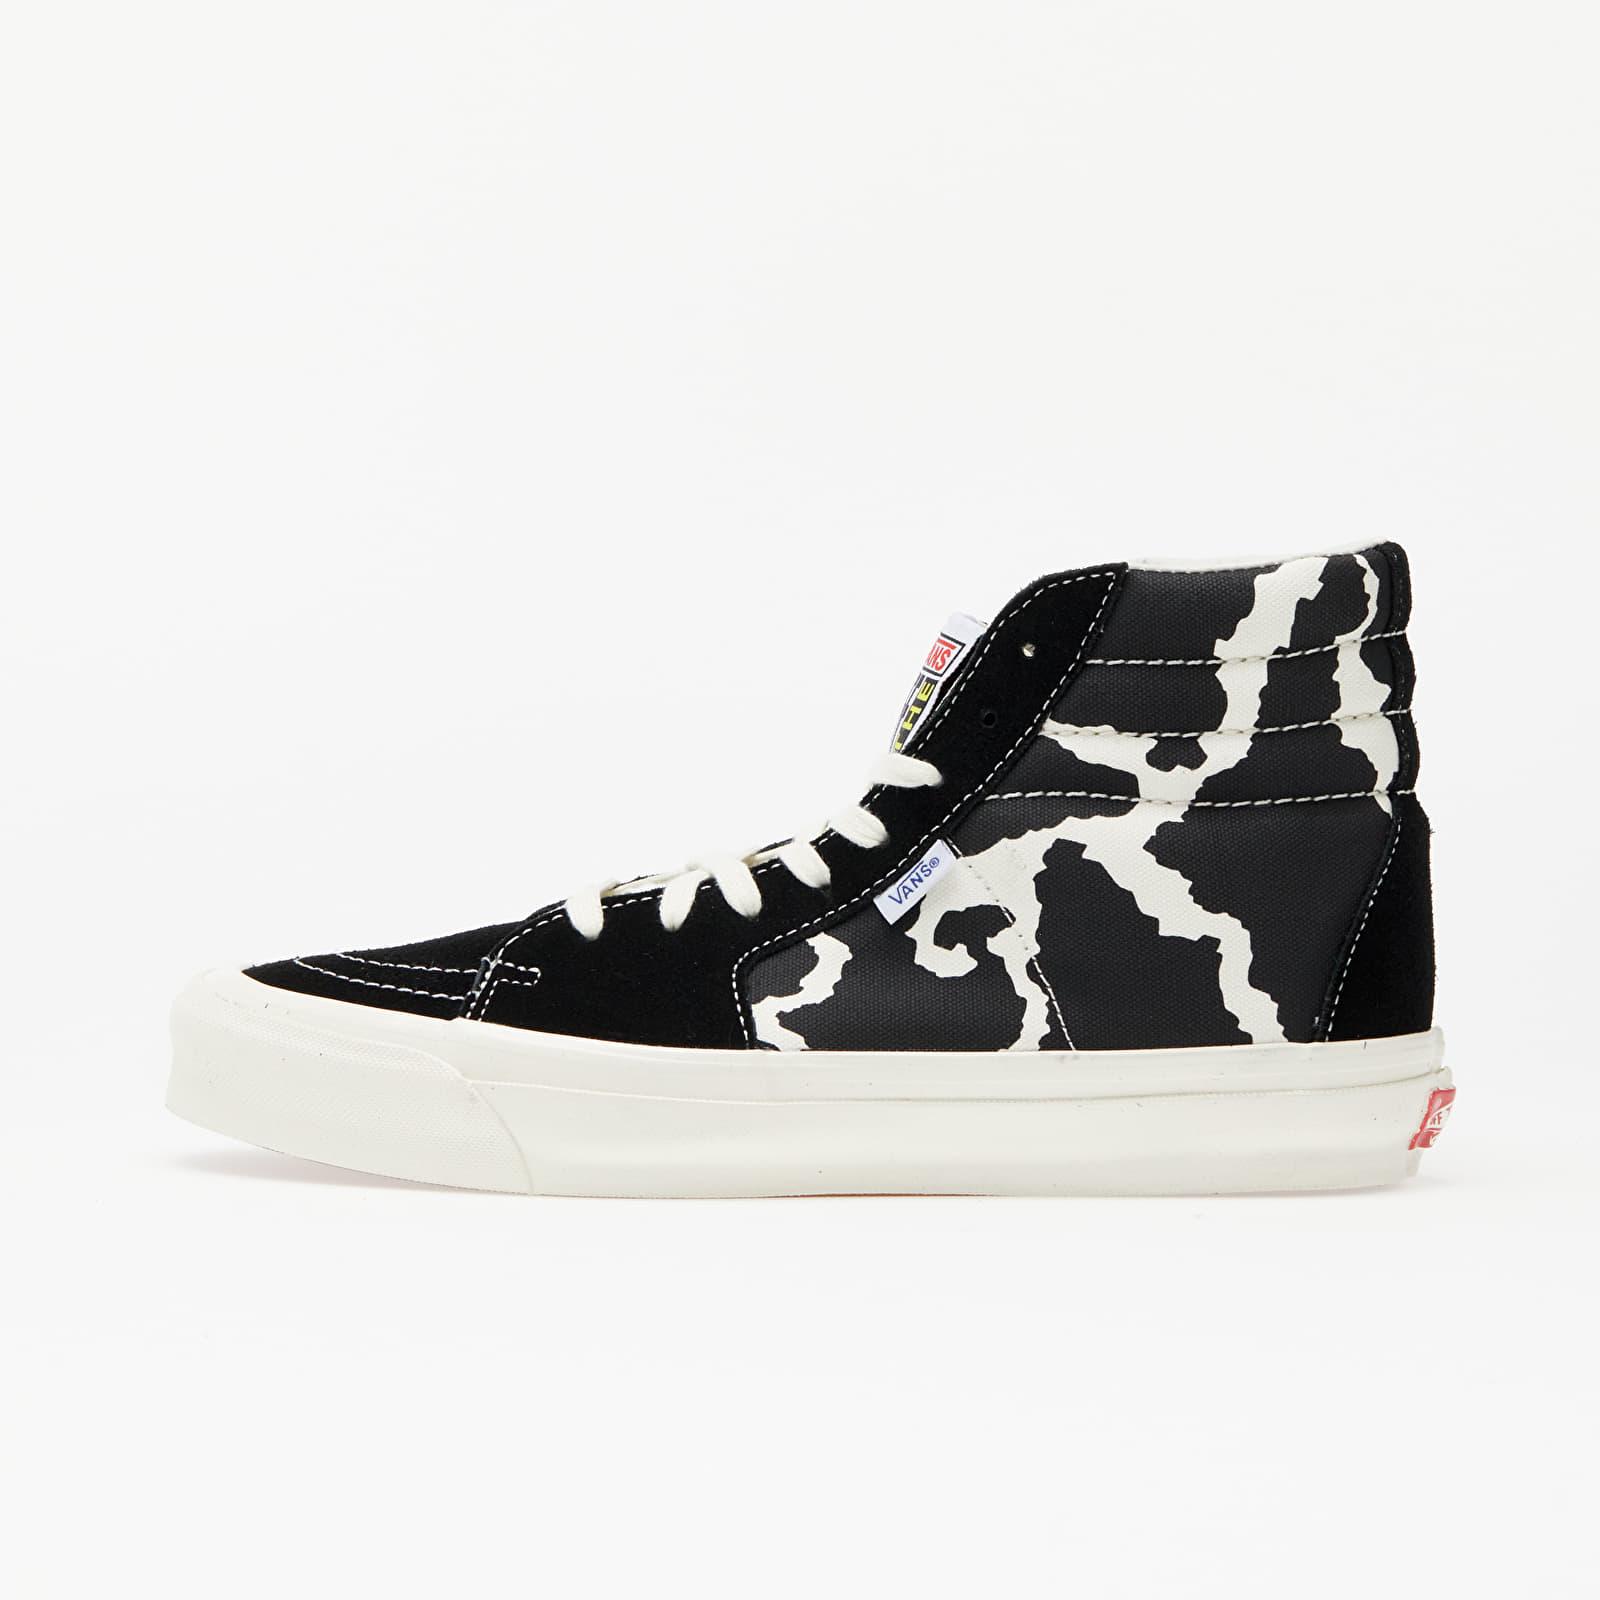 Férfi cipők Vans OG Style 38 NS LX (Suede/ Canvas) Classic White/ Black/ Marshmallow